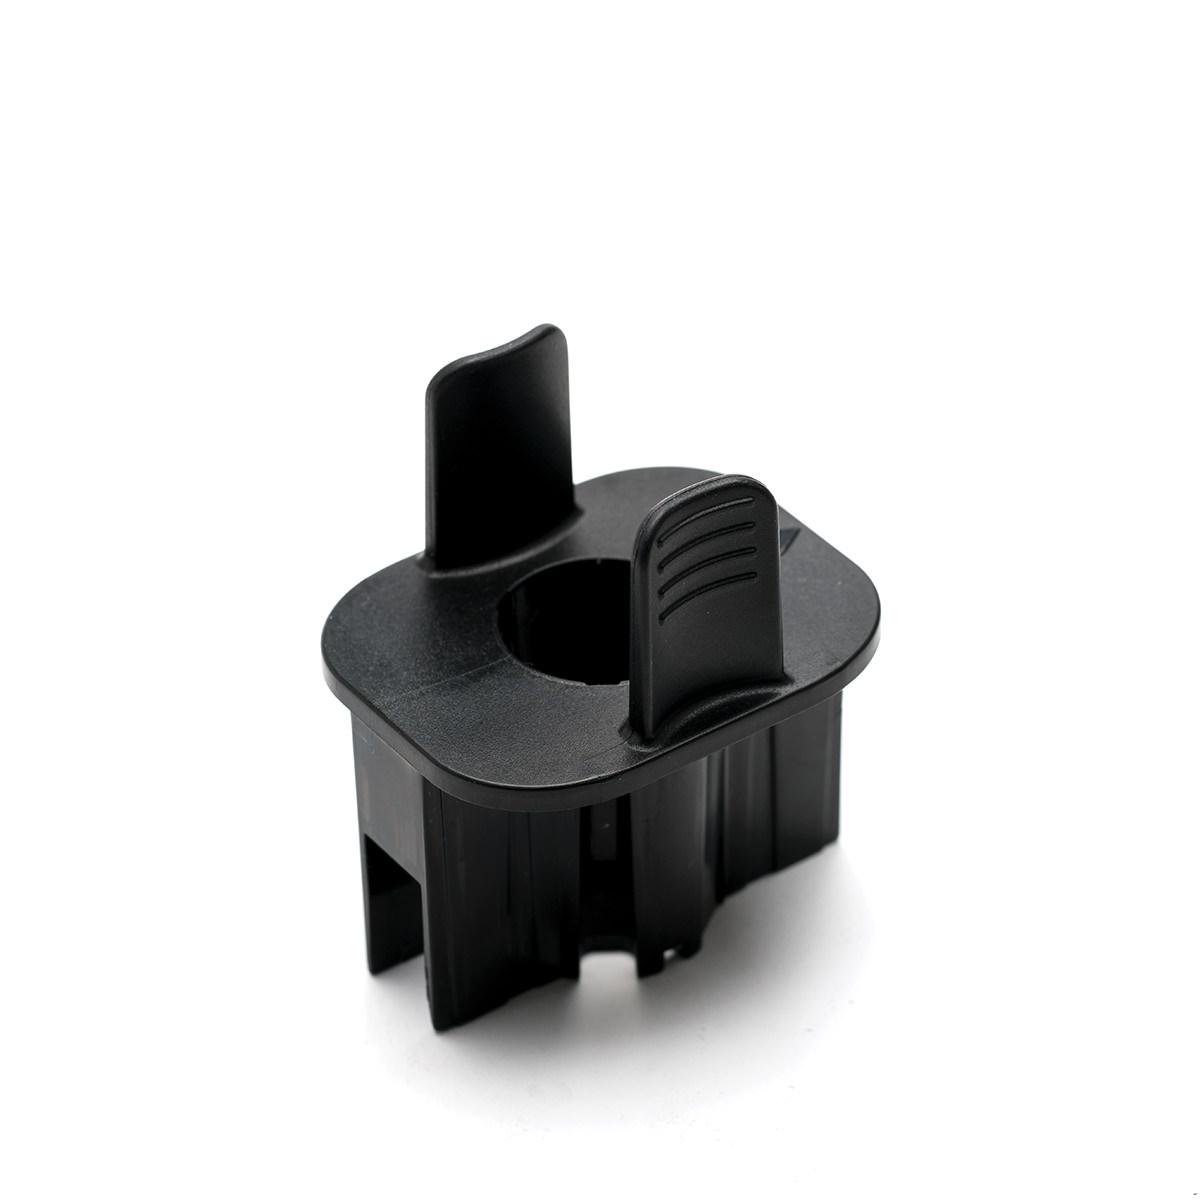 Spettrofotometro HI801 - iris - porta cuvette rotonde